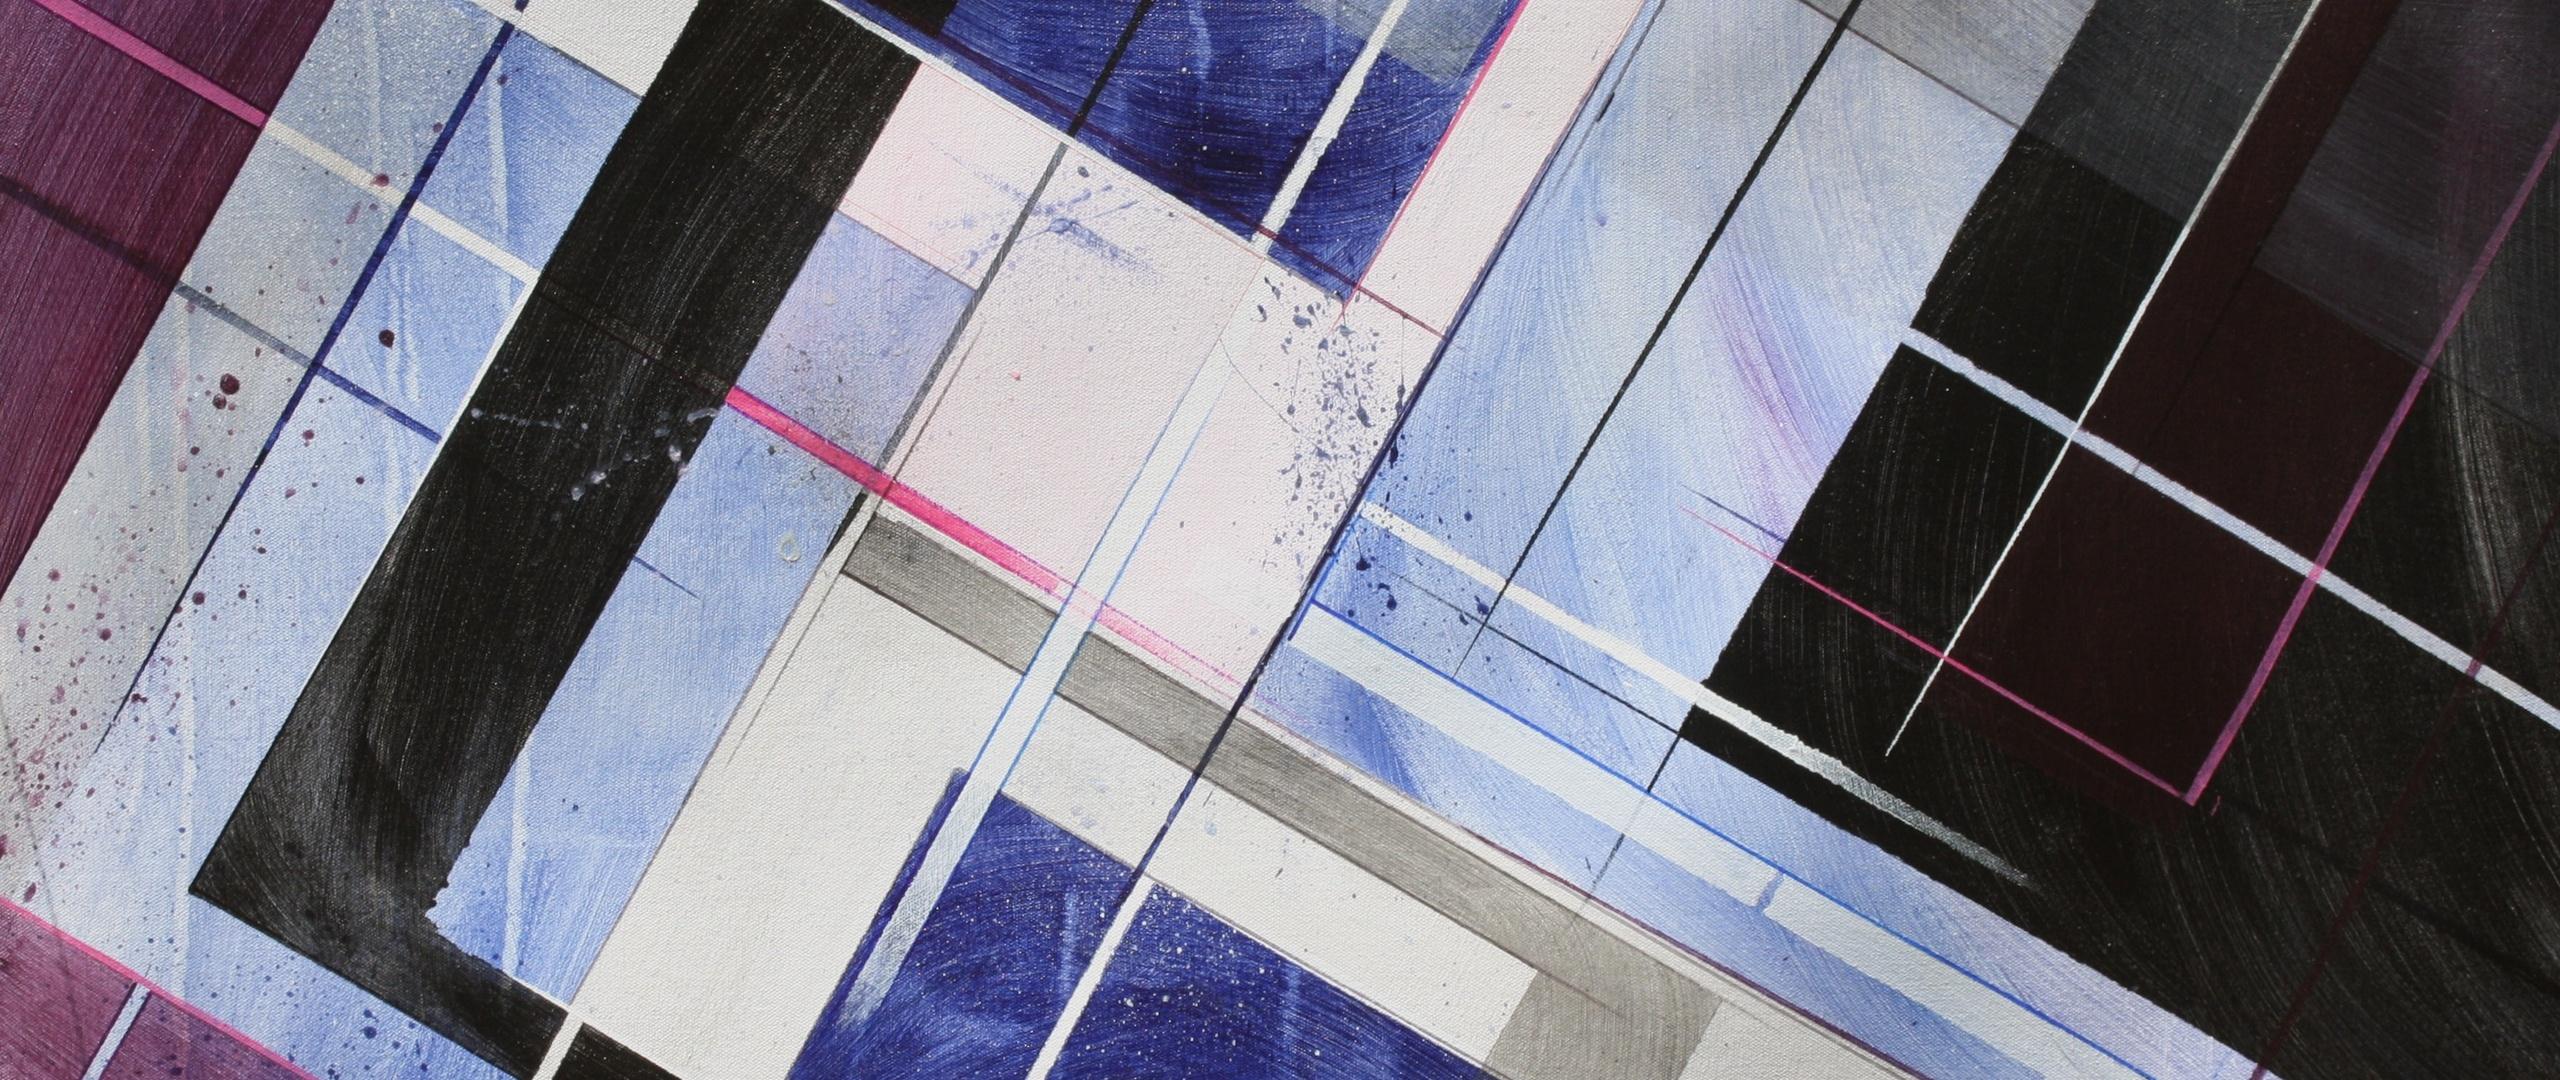 texture-pattern-abstract-pq.jpg